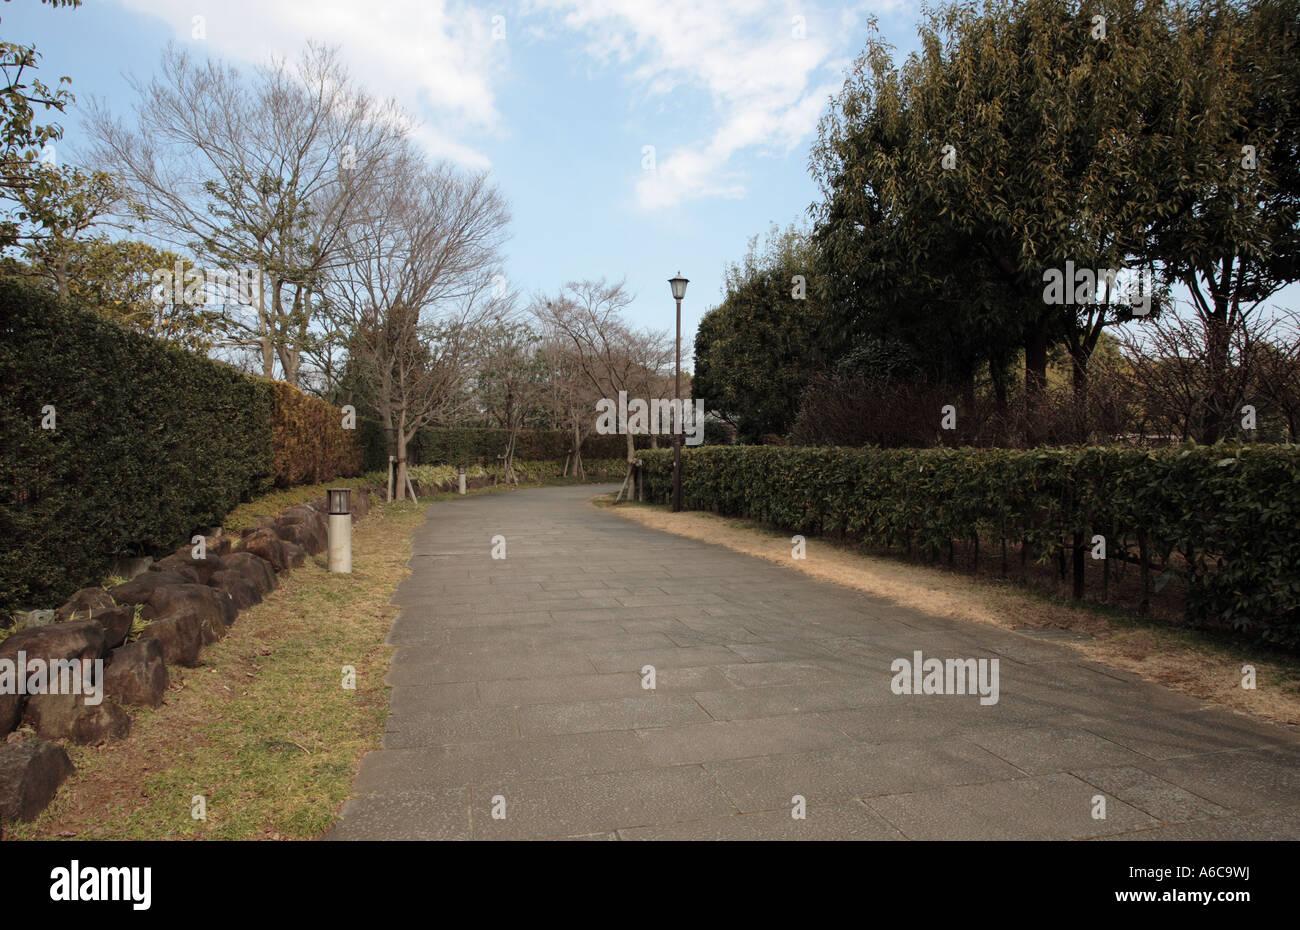 Walkway in Kashiwanoha Park, Kashiwa City, Chiba Prefecture, Japan. Stock Photo